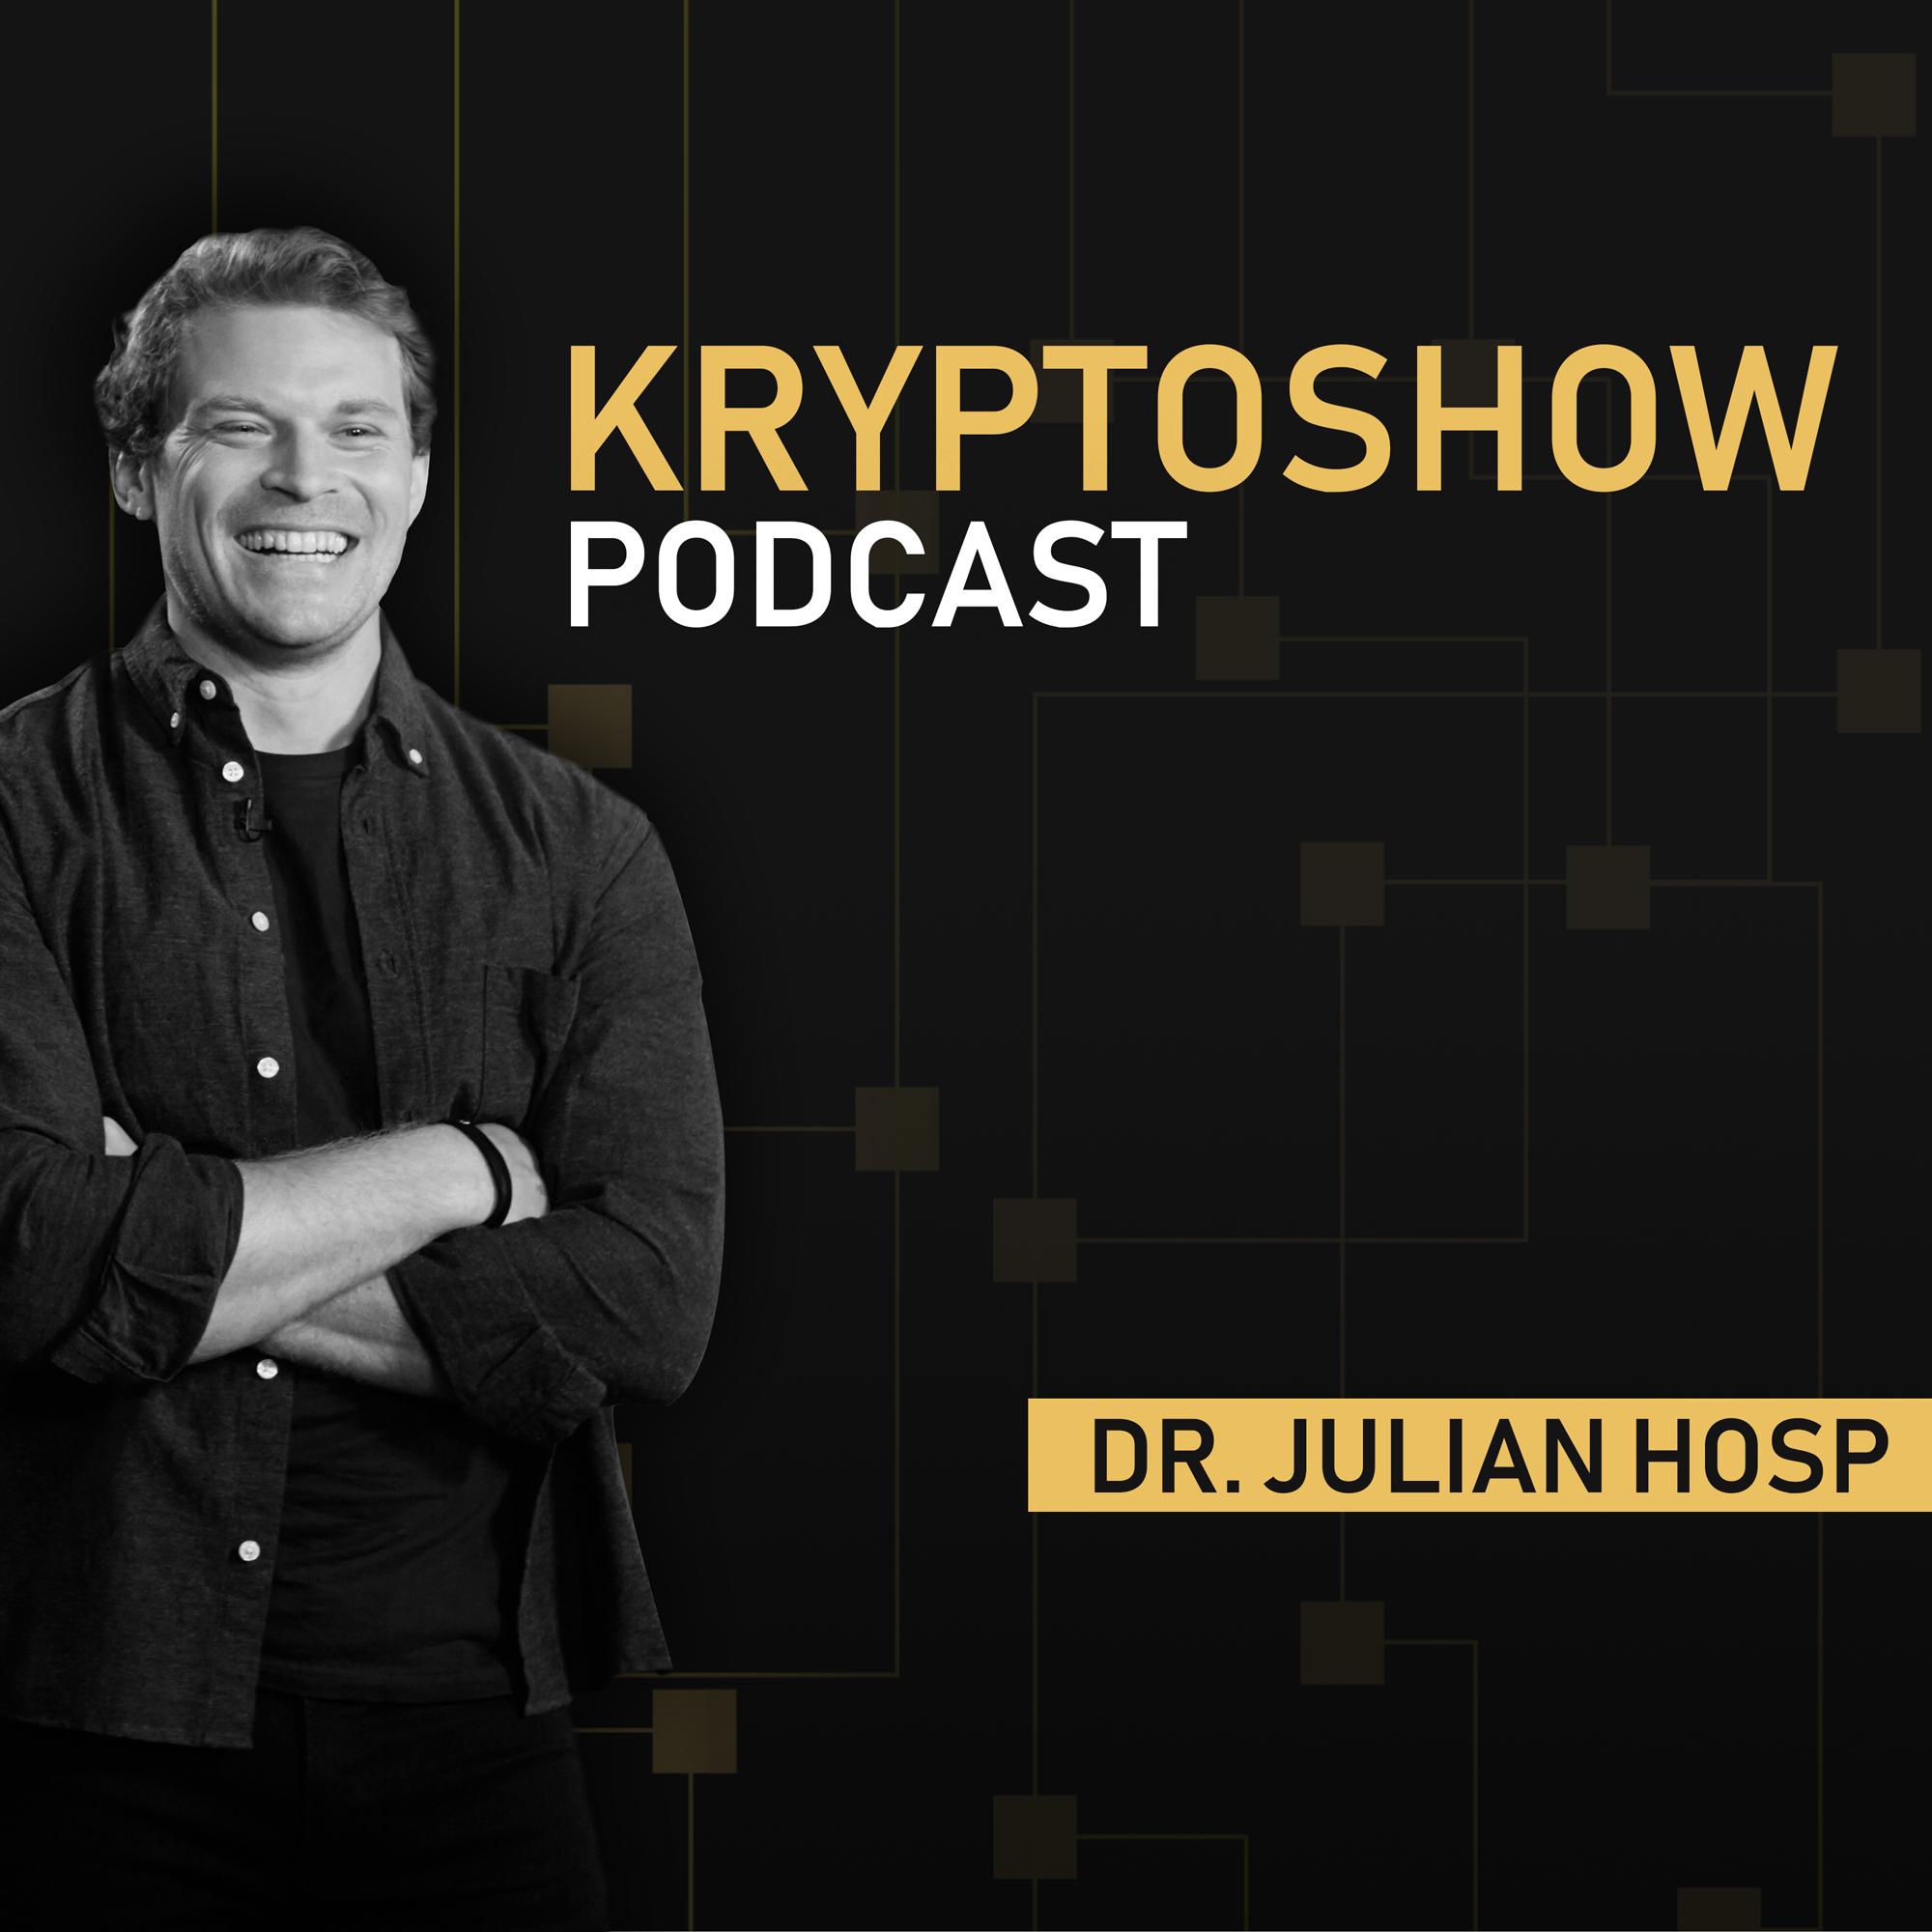 Artwork for #510 Blockchain: Heilsbringer oder Jobkiller? – Dr. Julian Hosp & Harry Behrens